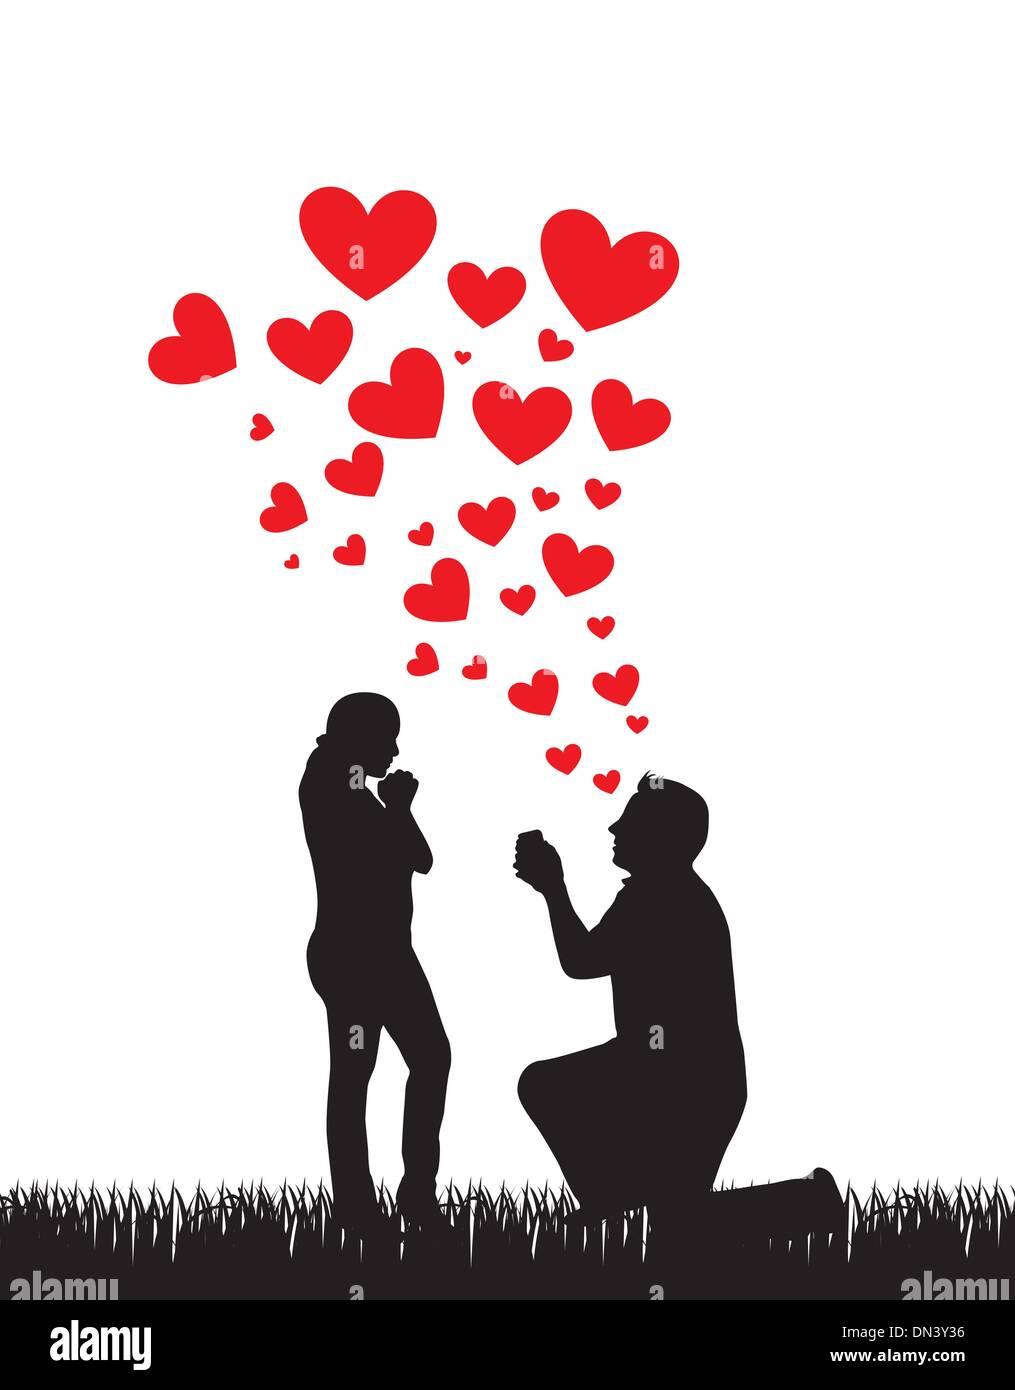 Proposta wedding Immagini Stock